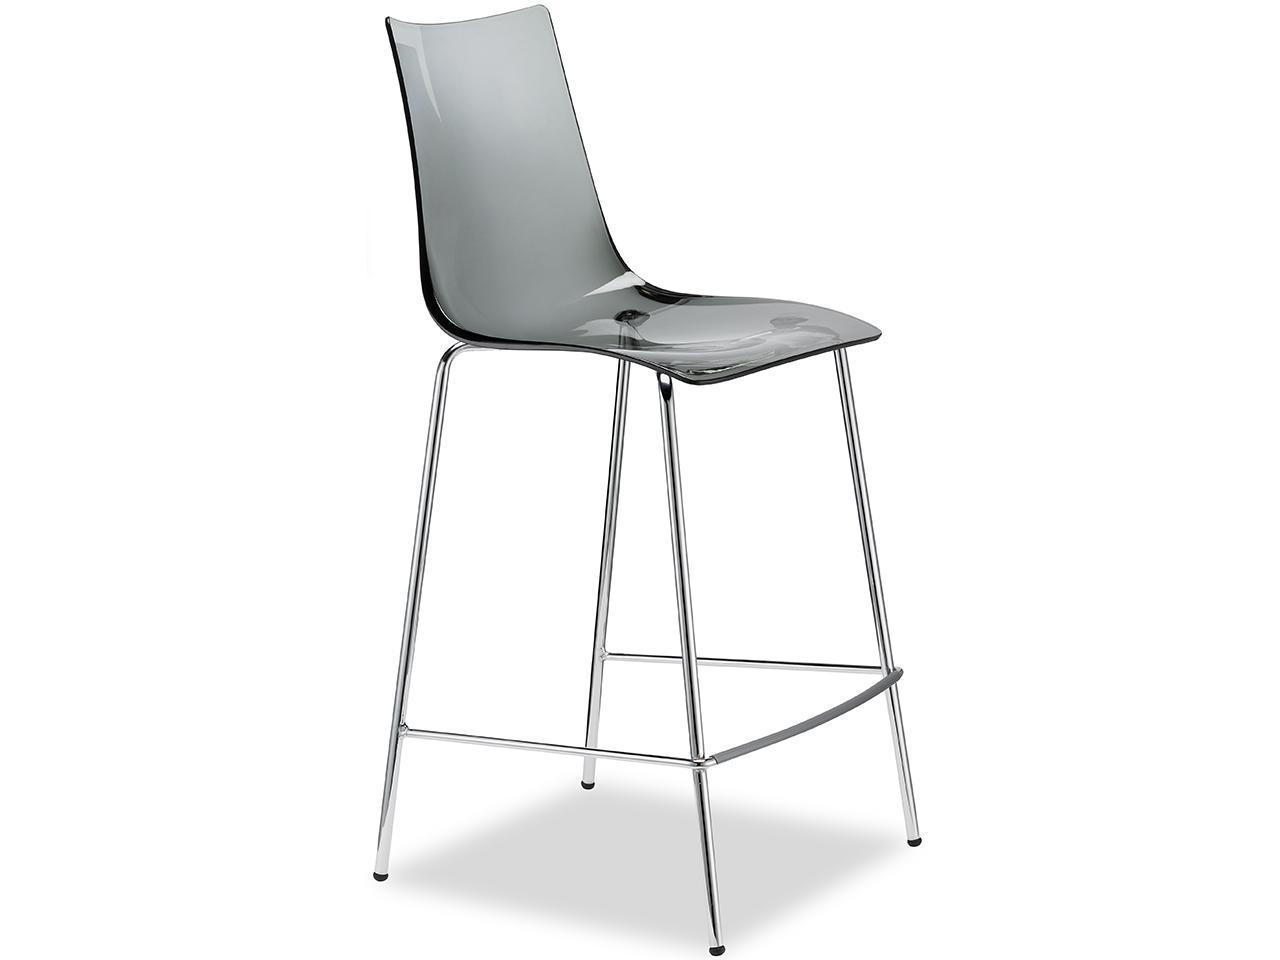 Полубарный прозрачный стул Zebra Antishock Barstool